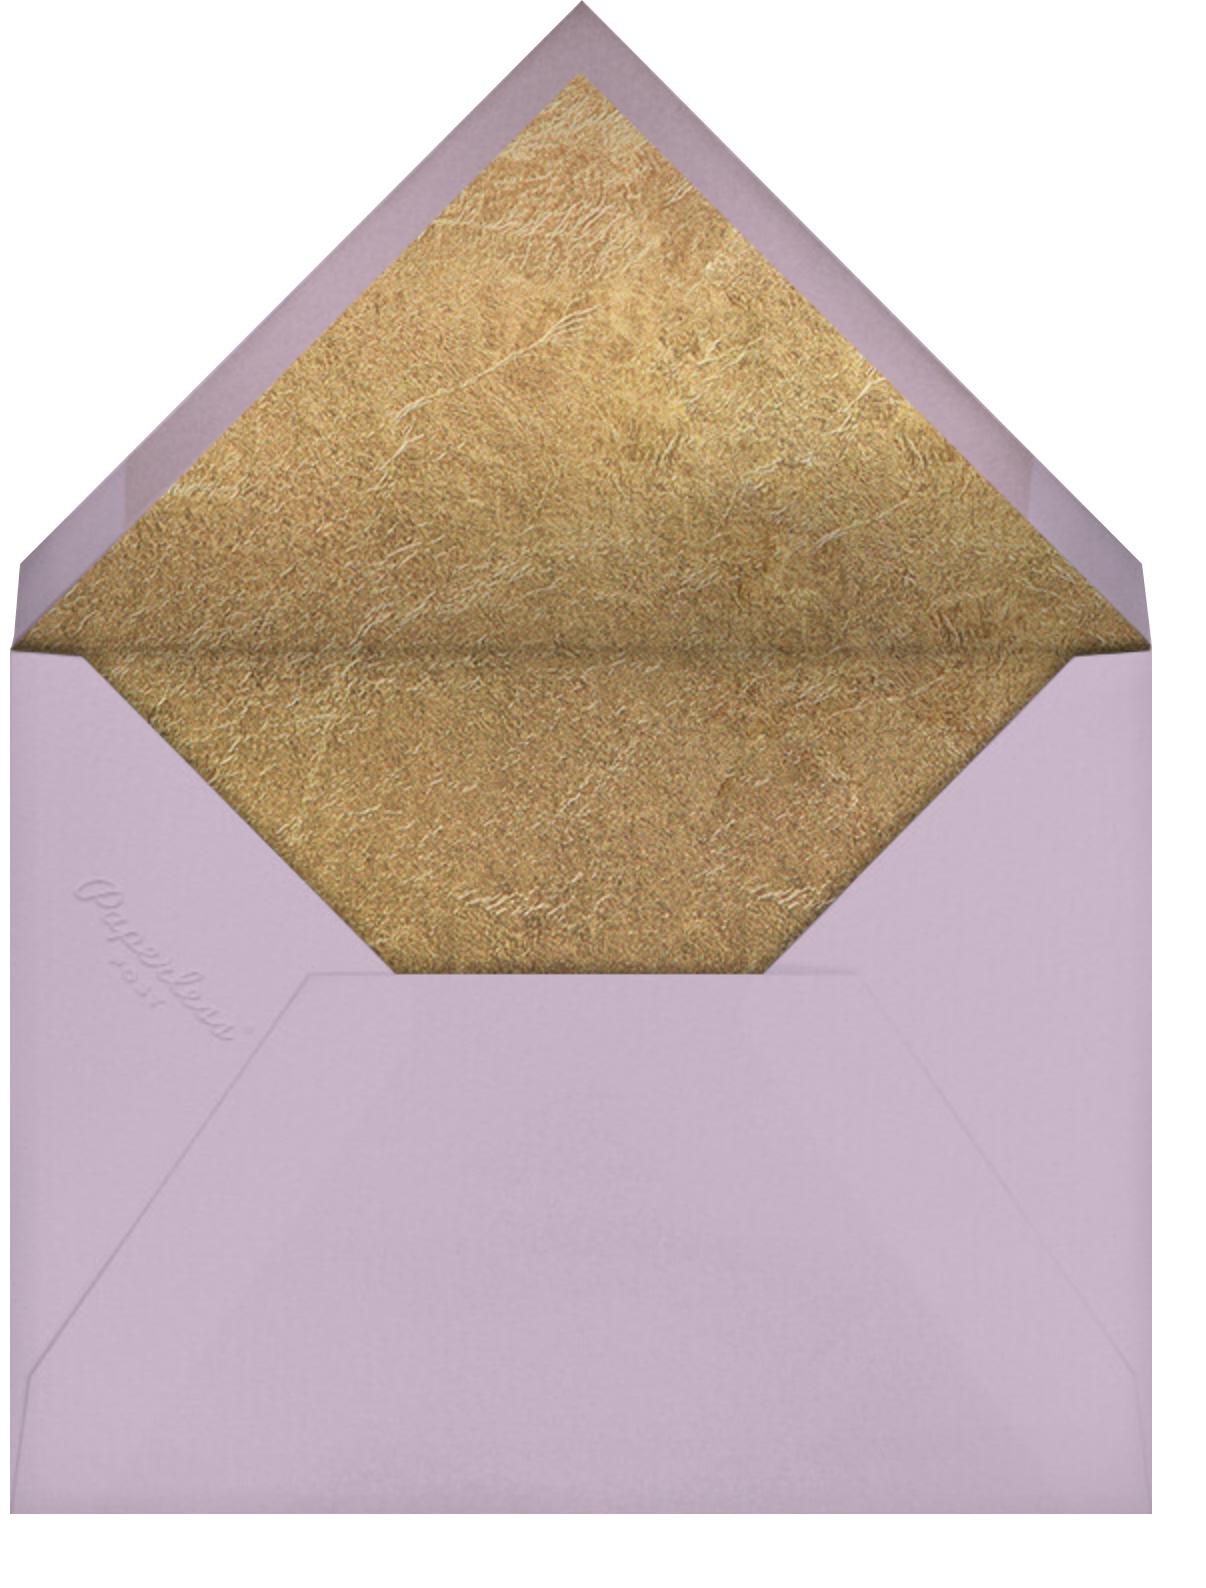 Inlay - Mauve - Kelly Wearstler - Adult birthday - envelope back